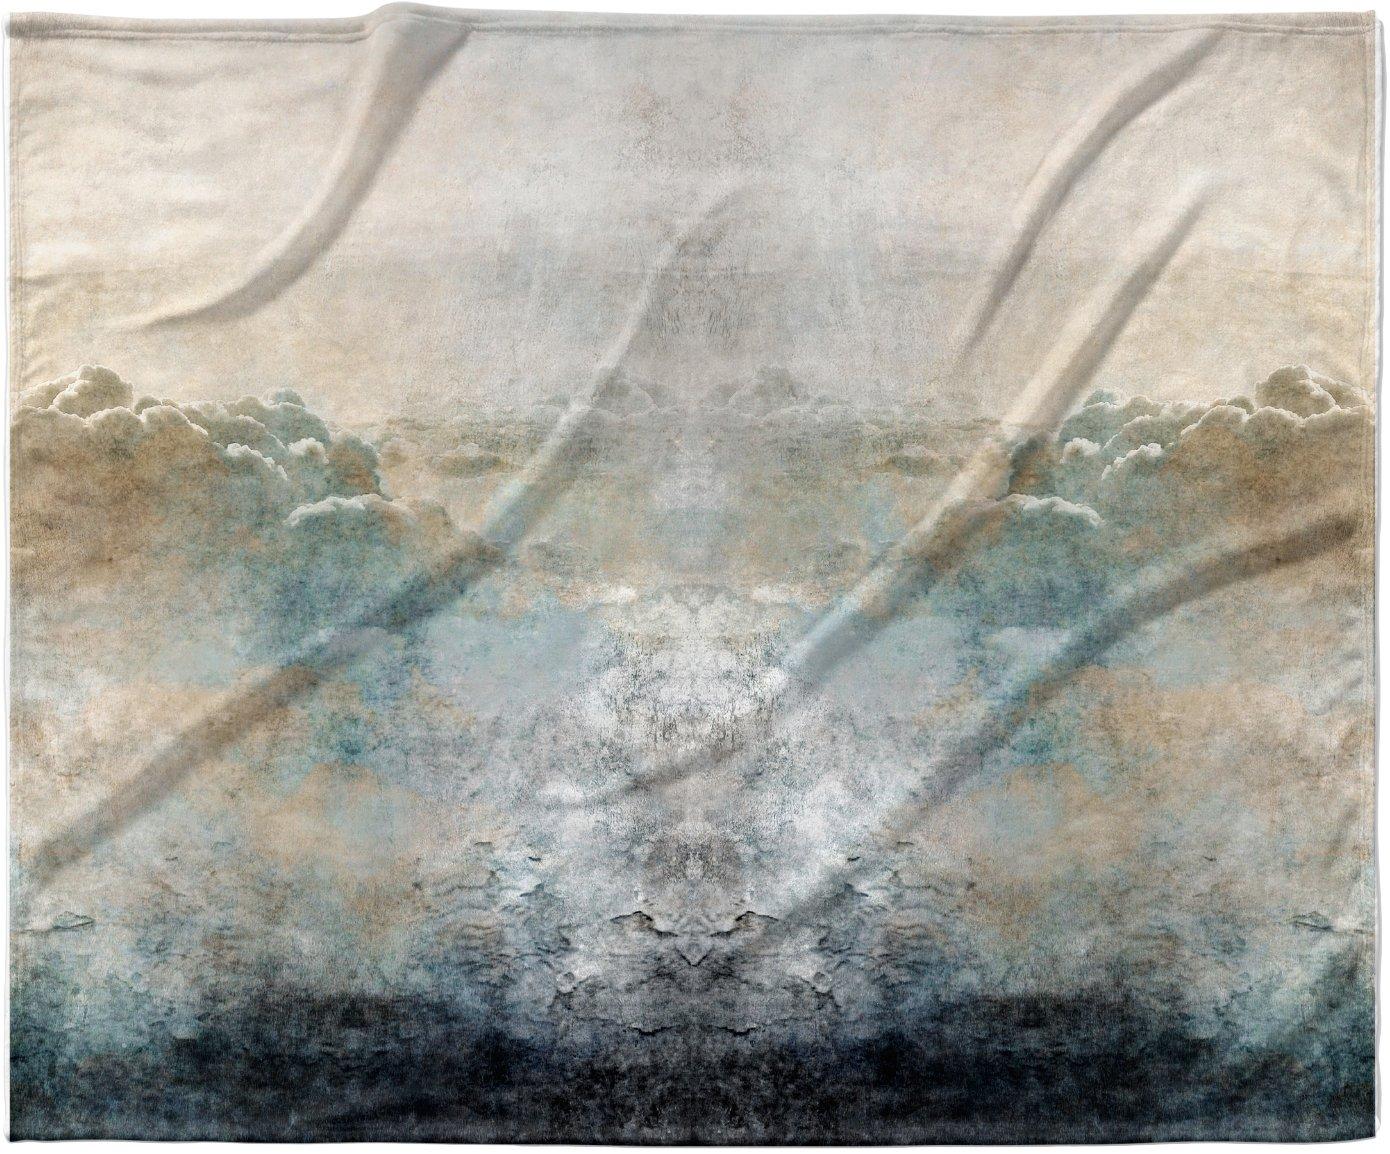 40 x 30 KESS InHouse Pia Heaven II Mixed Mediia Abstract Fleece Baby Blanket